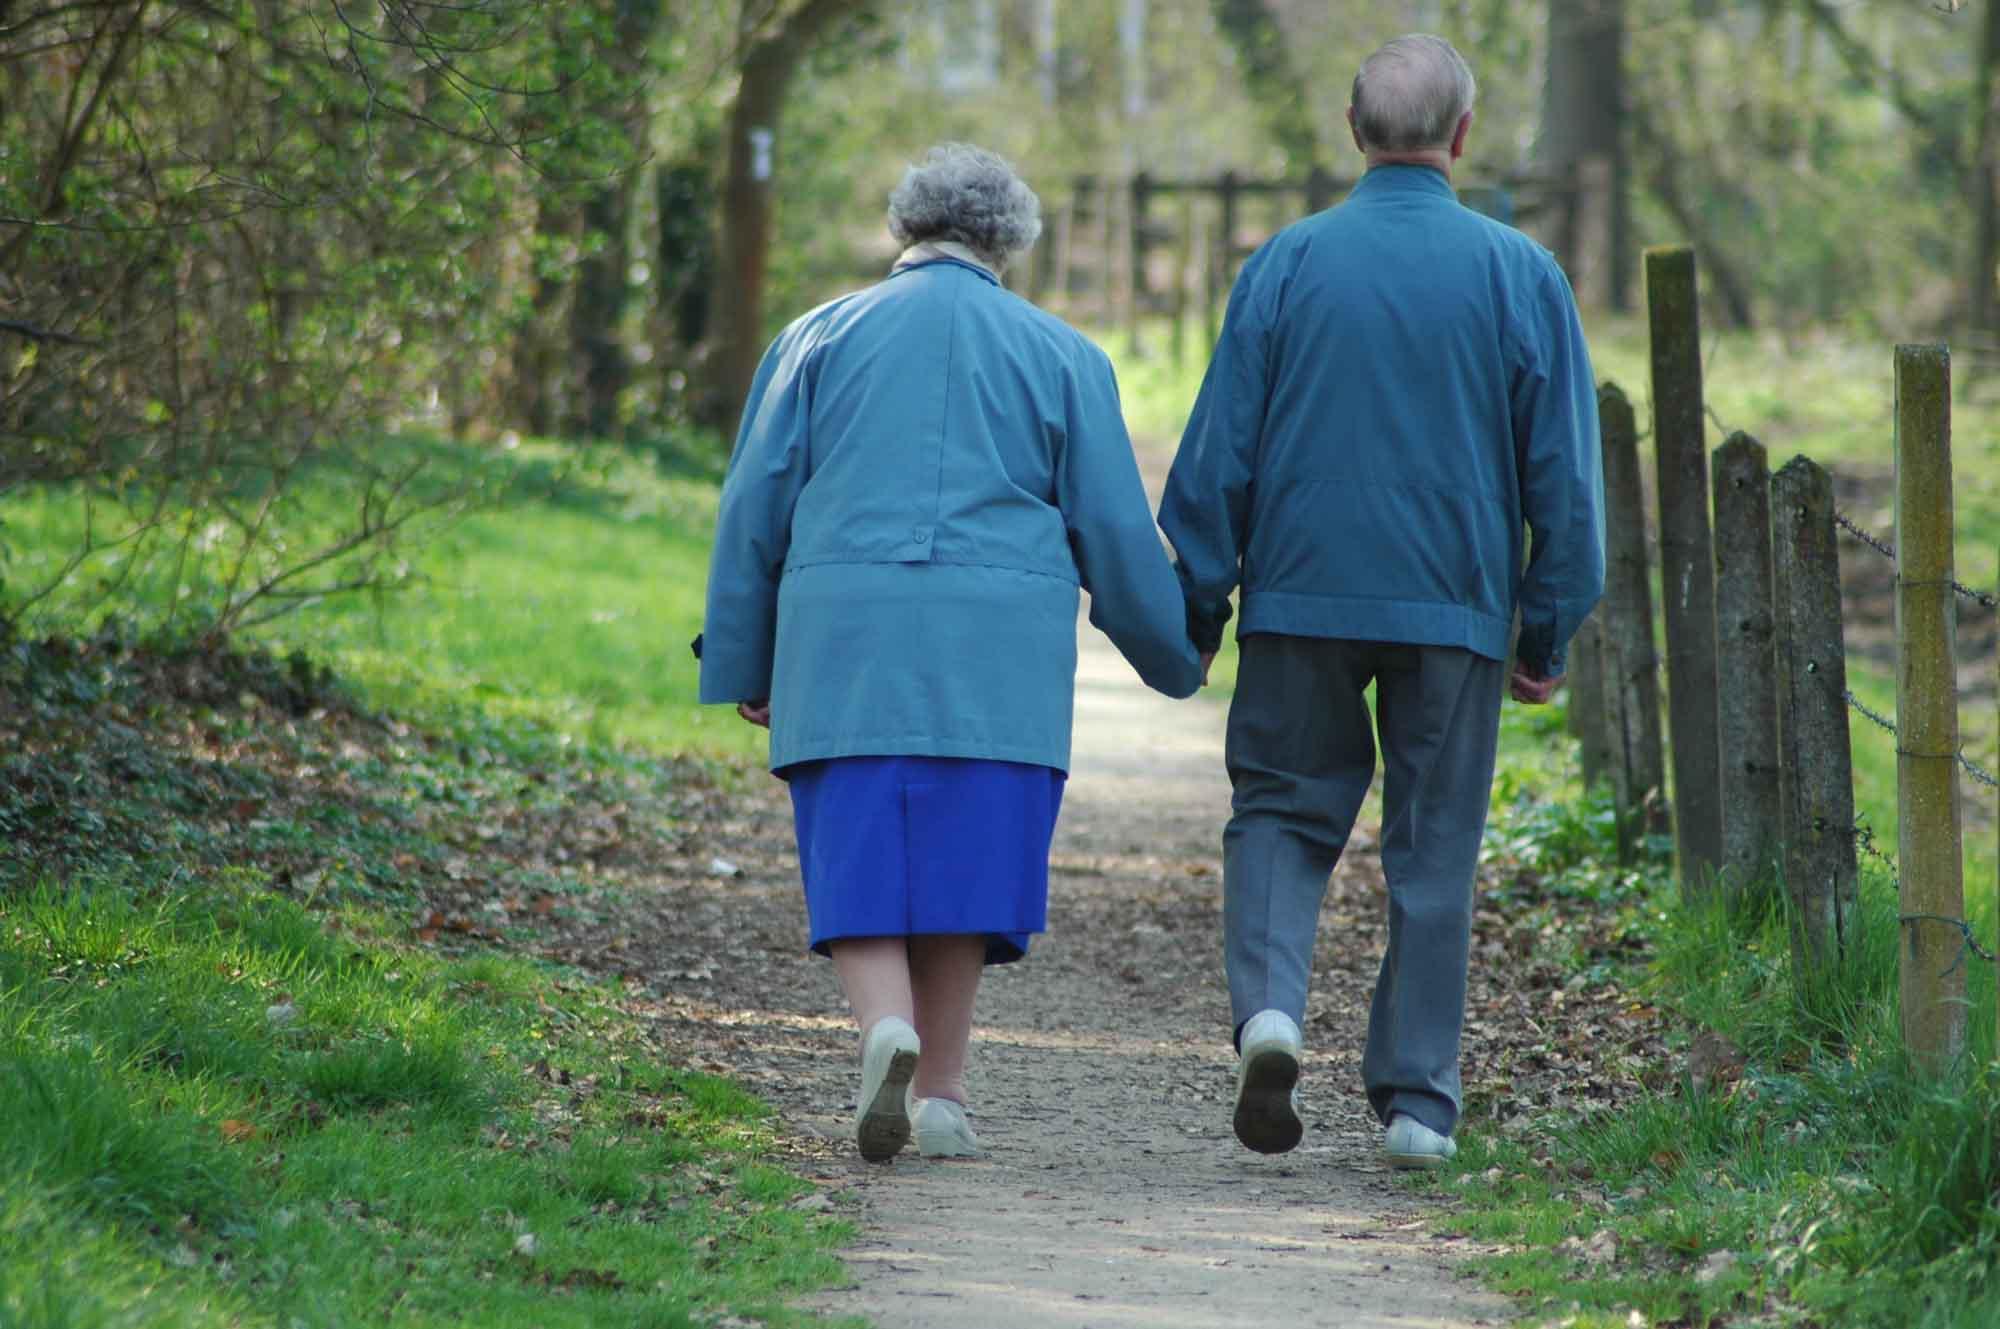 Pareja de ancianos paseando